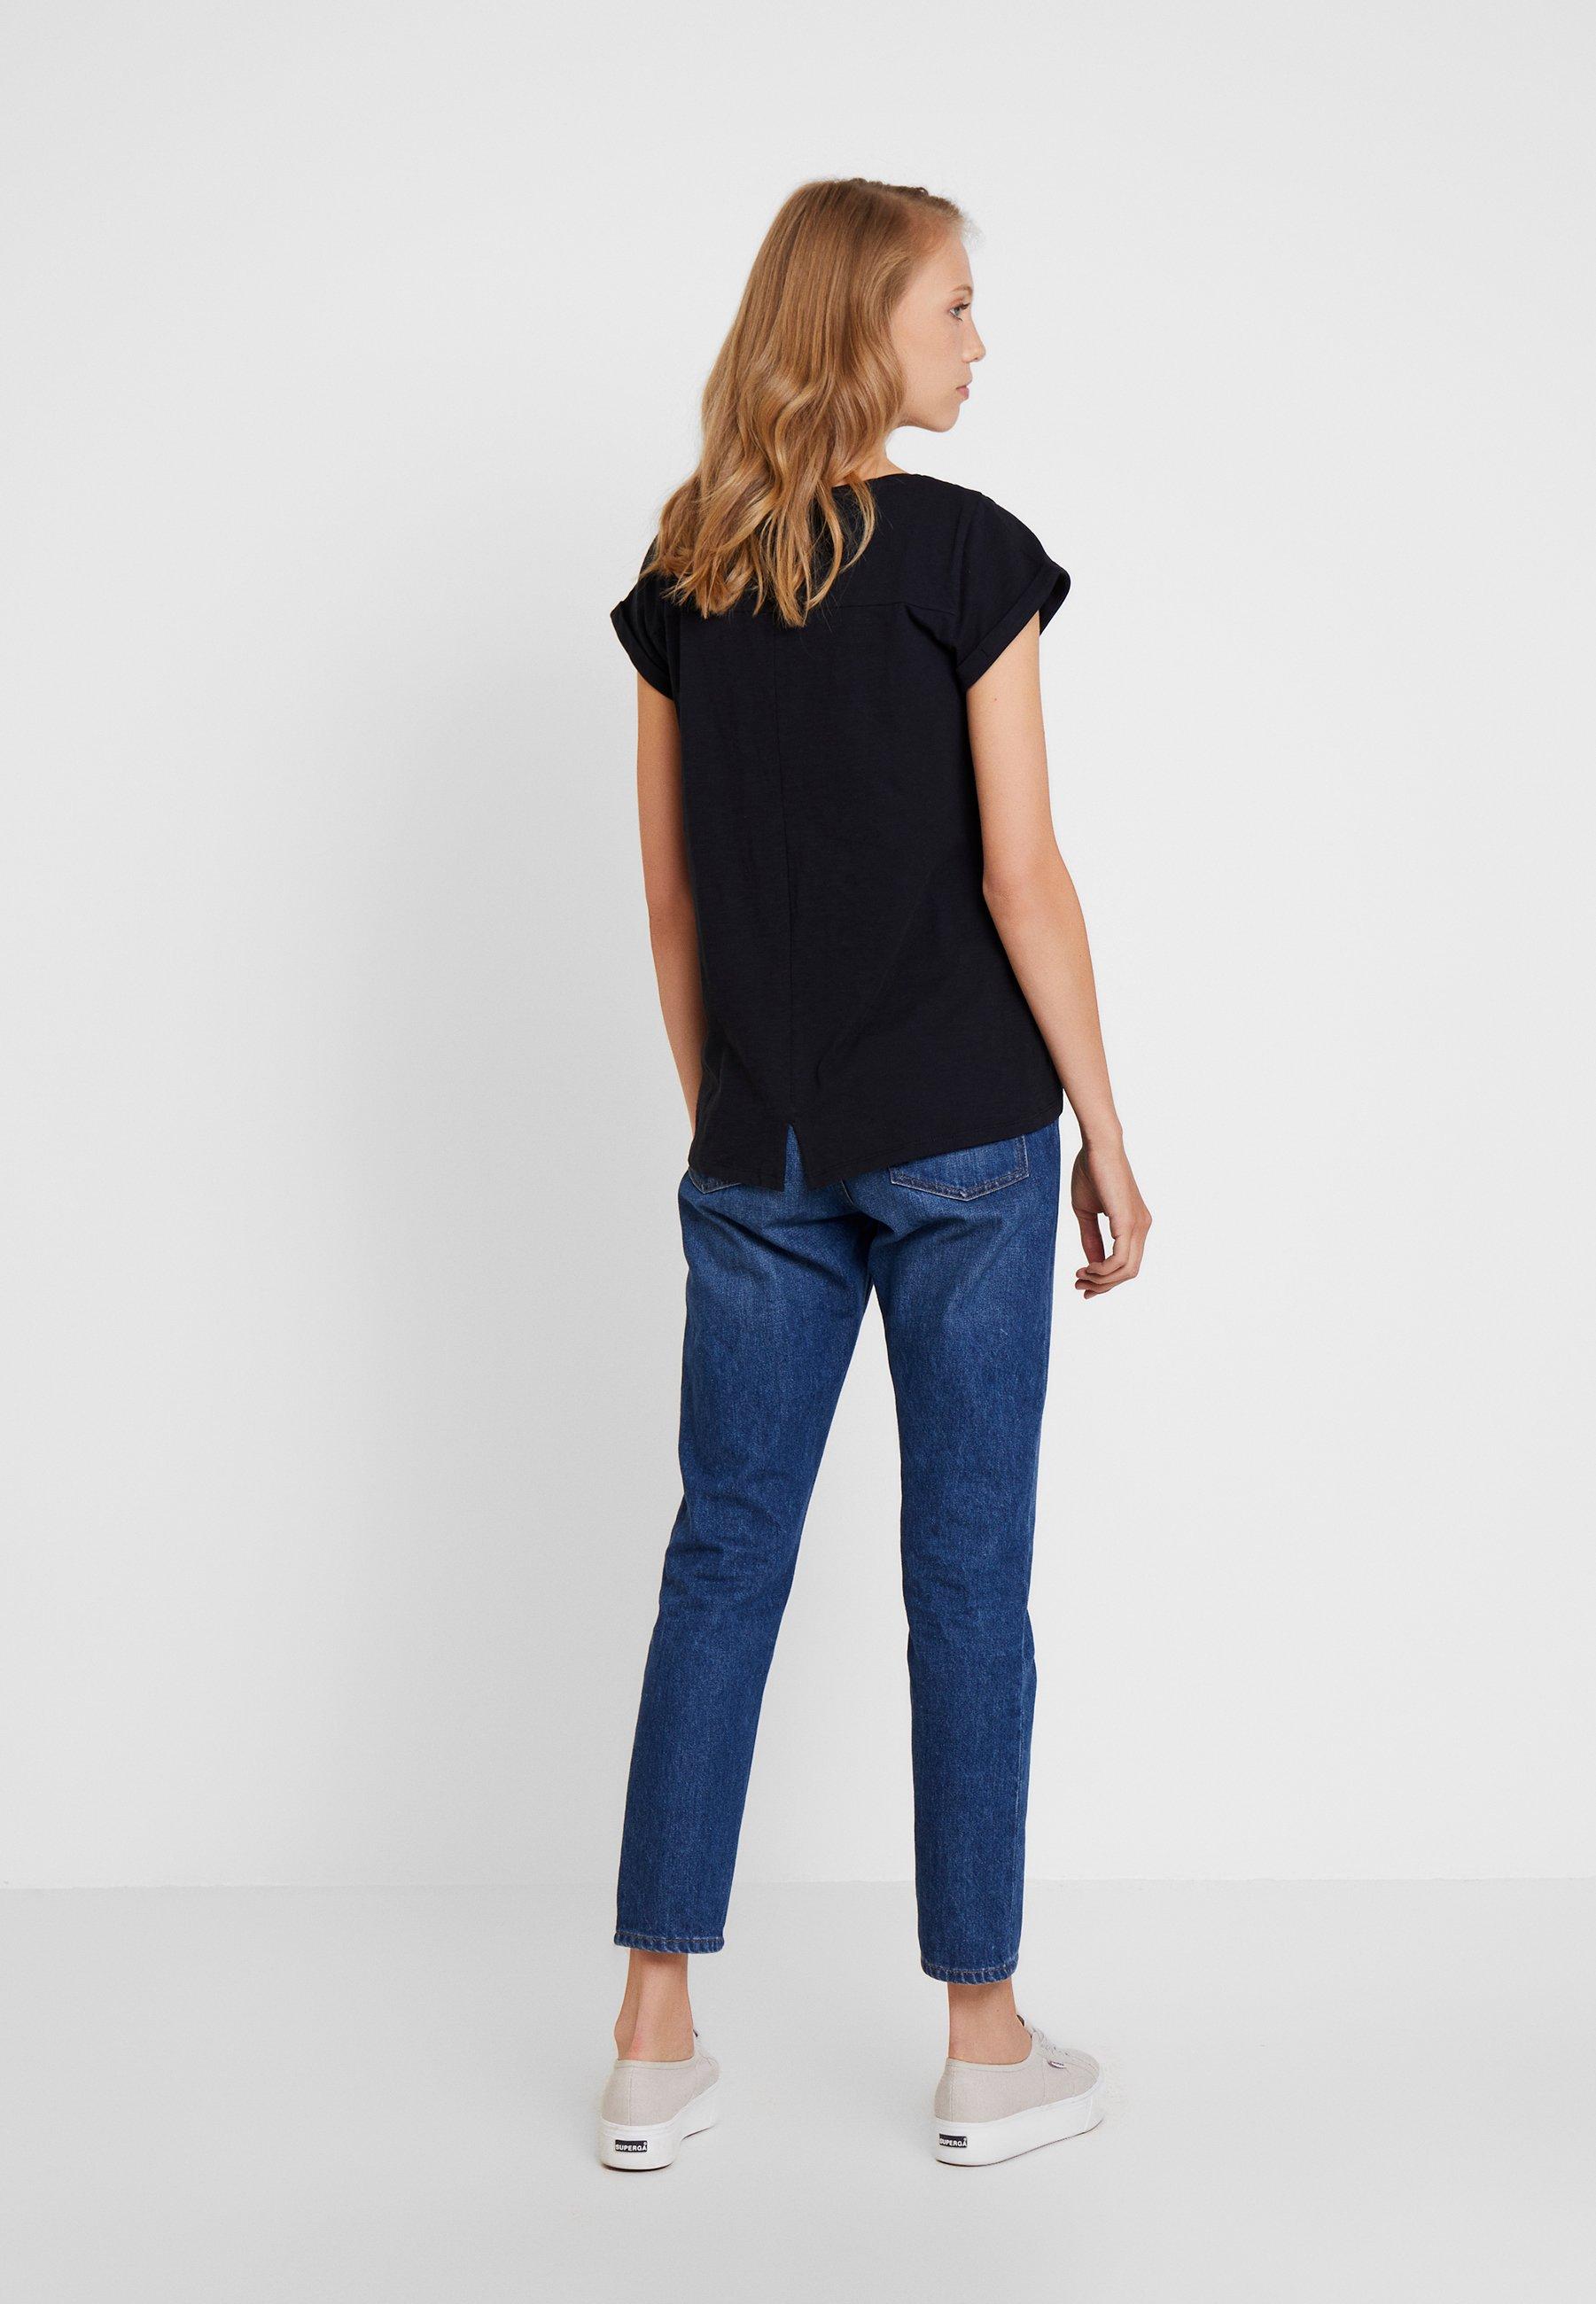 Esprit LibellT Basique shirt Logo Black yf76Ybgv